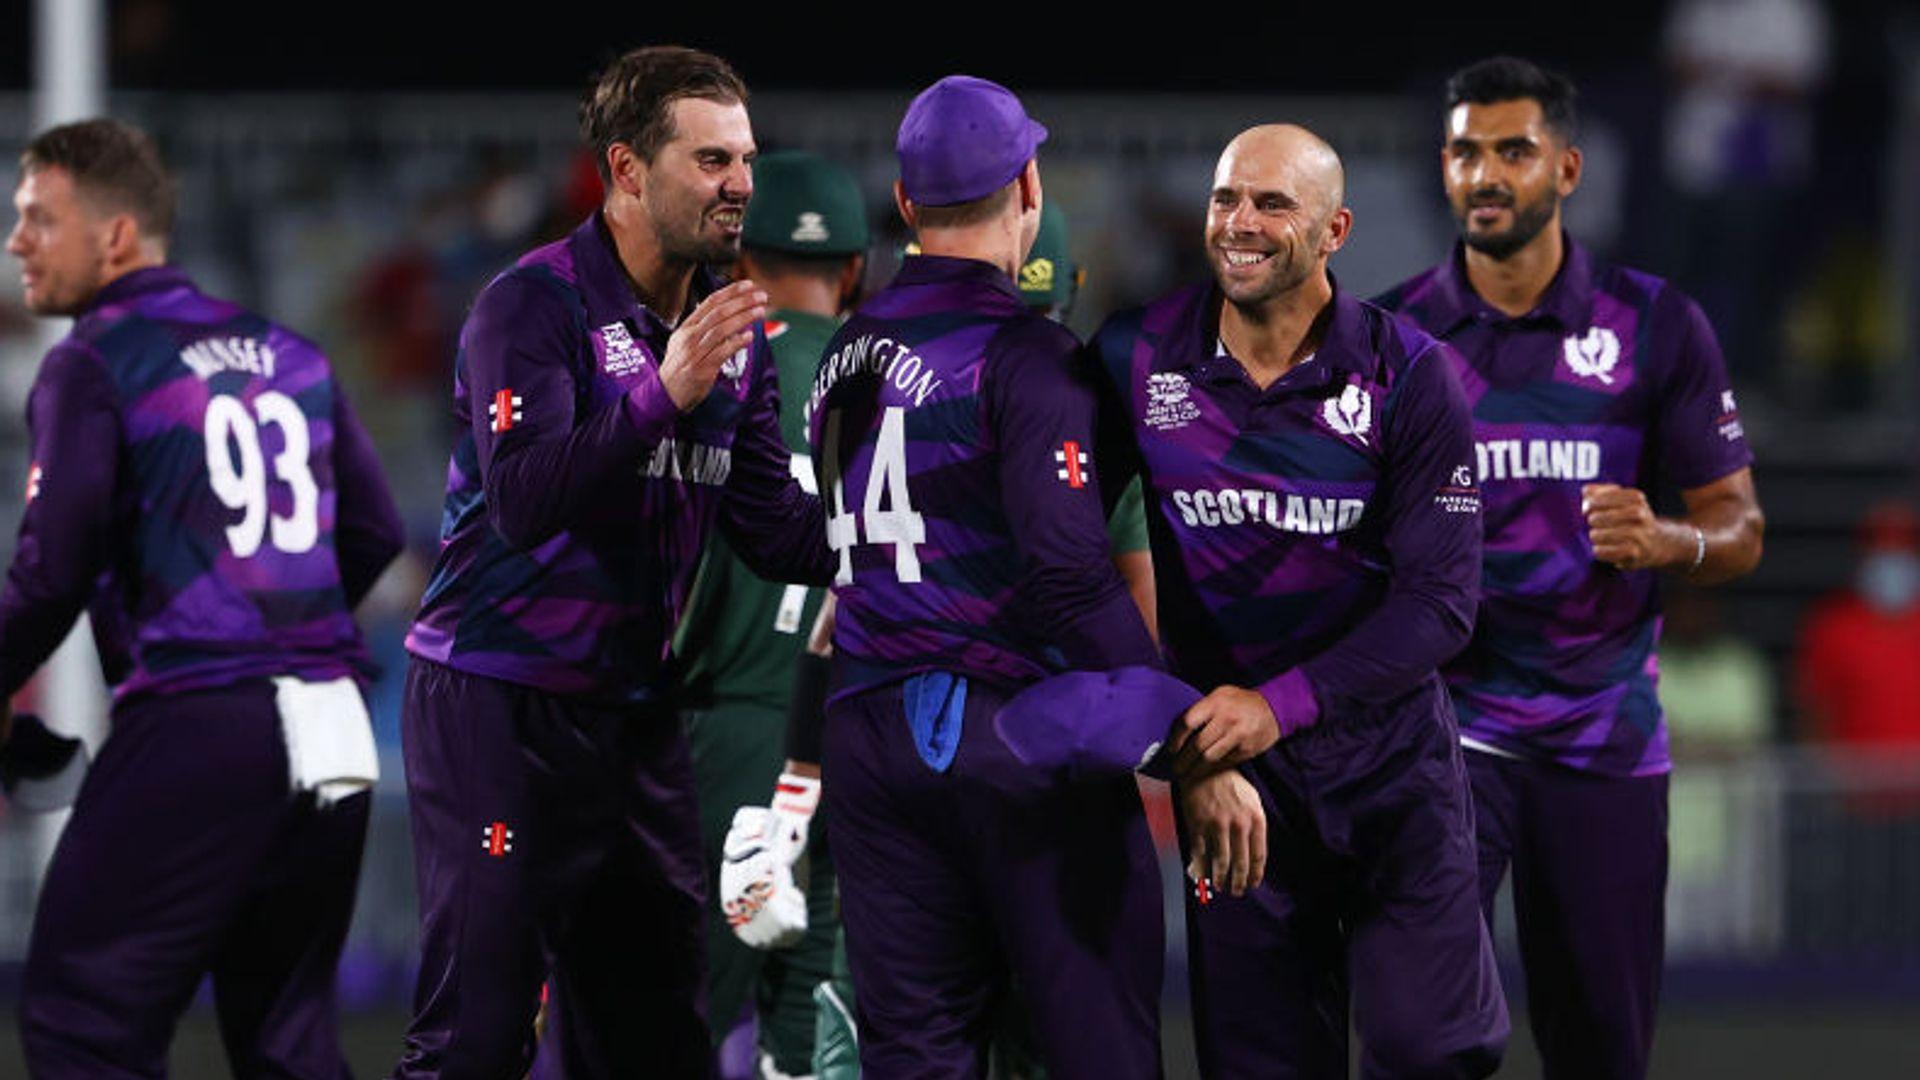 Bangladesh vs Scotland – Highlights & Stats